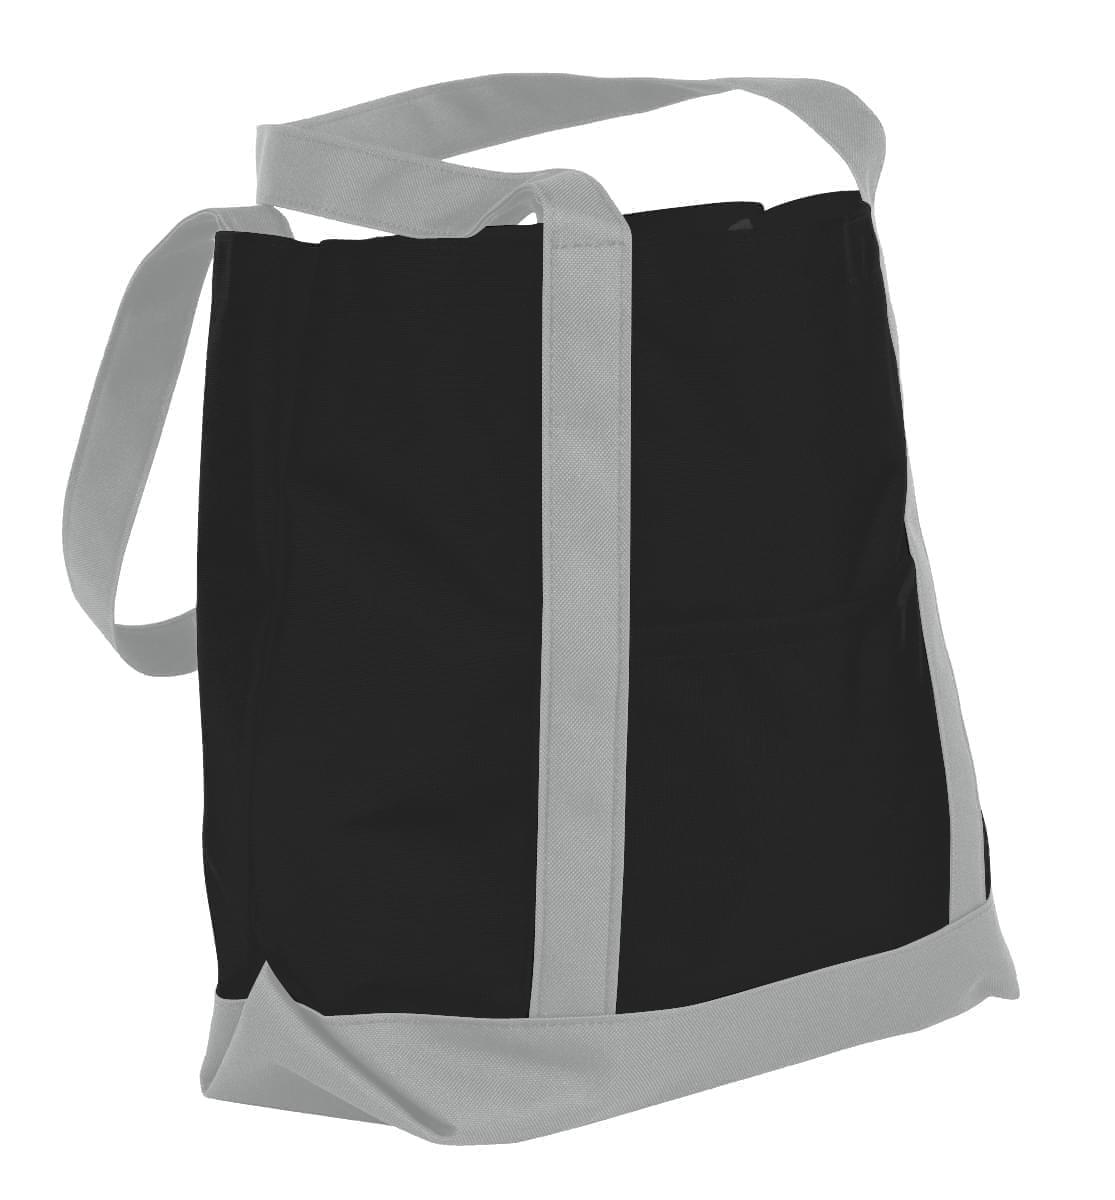 USA Made Canvas Fashion Tote Bags, Black-Grey, XAACL1UAHN